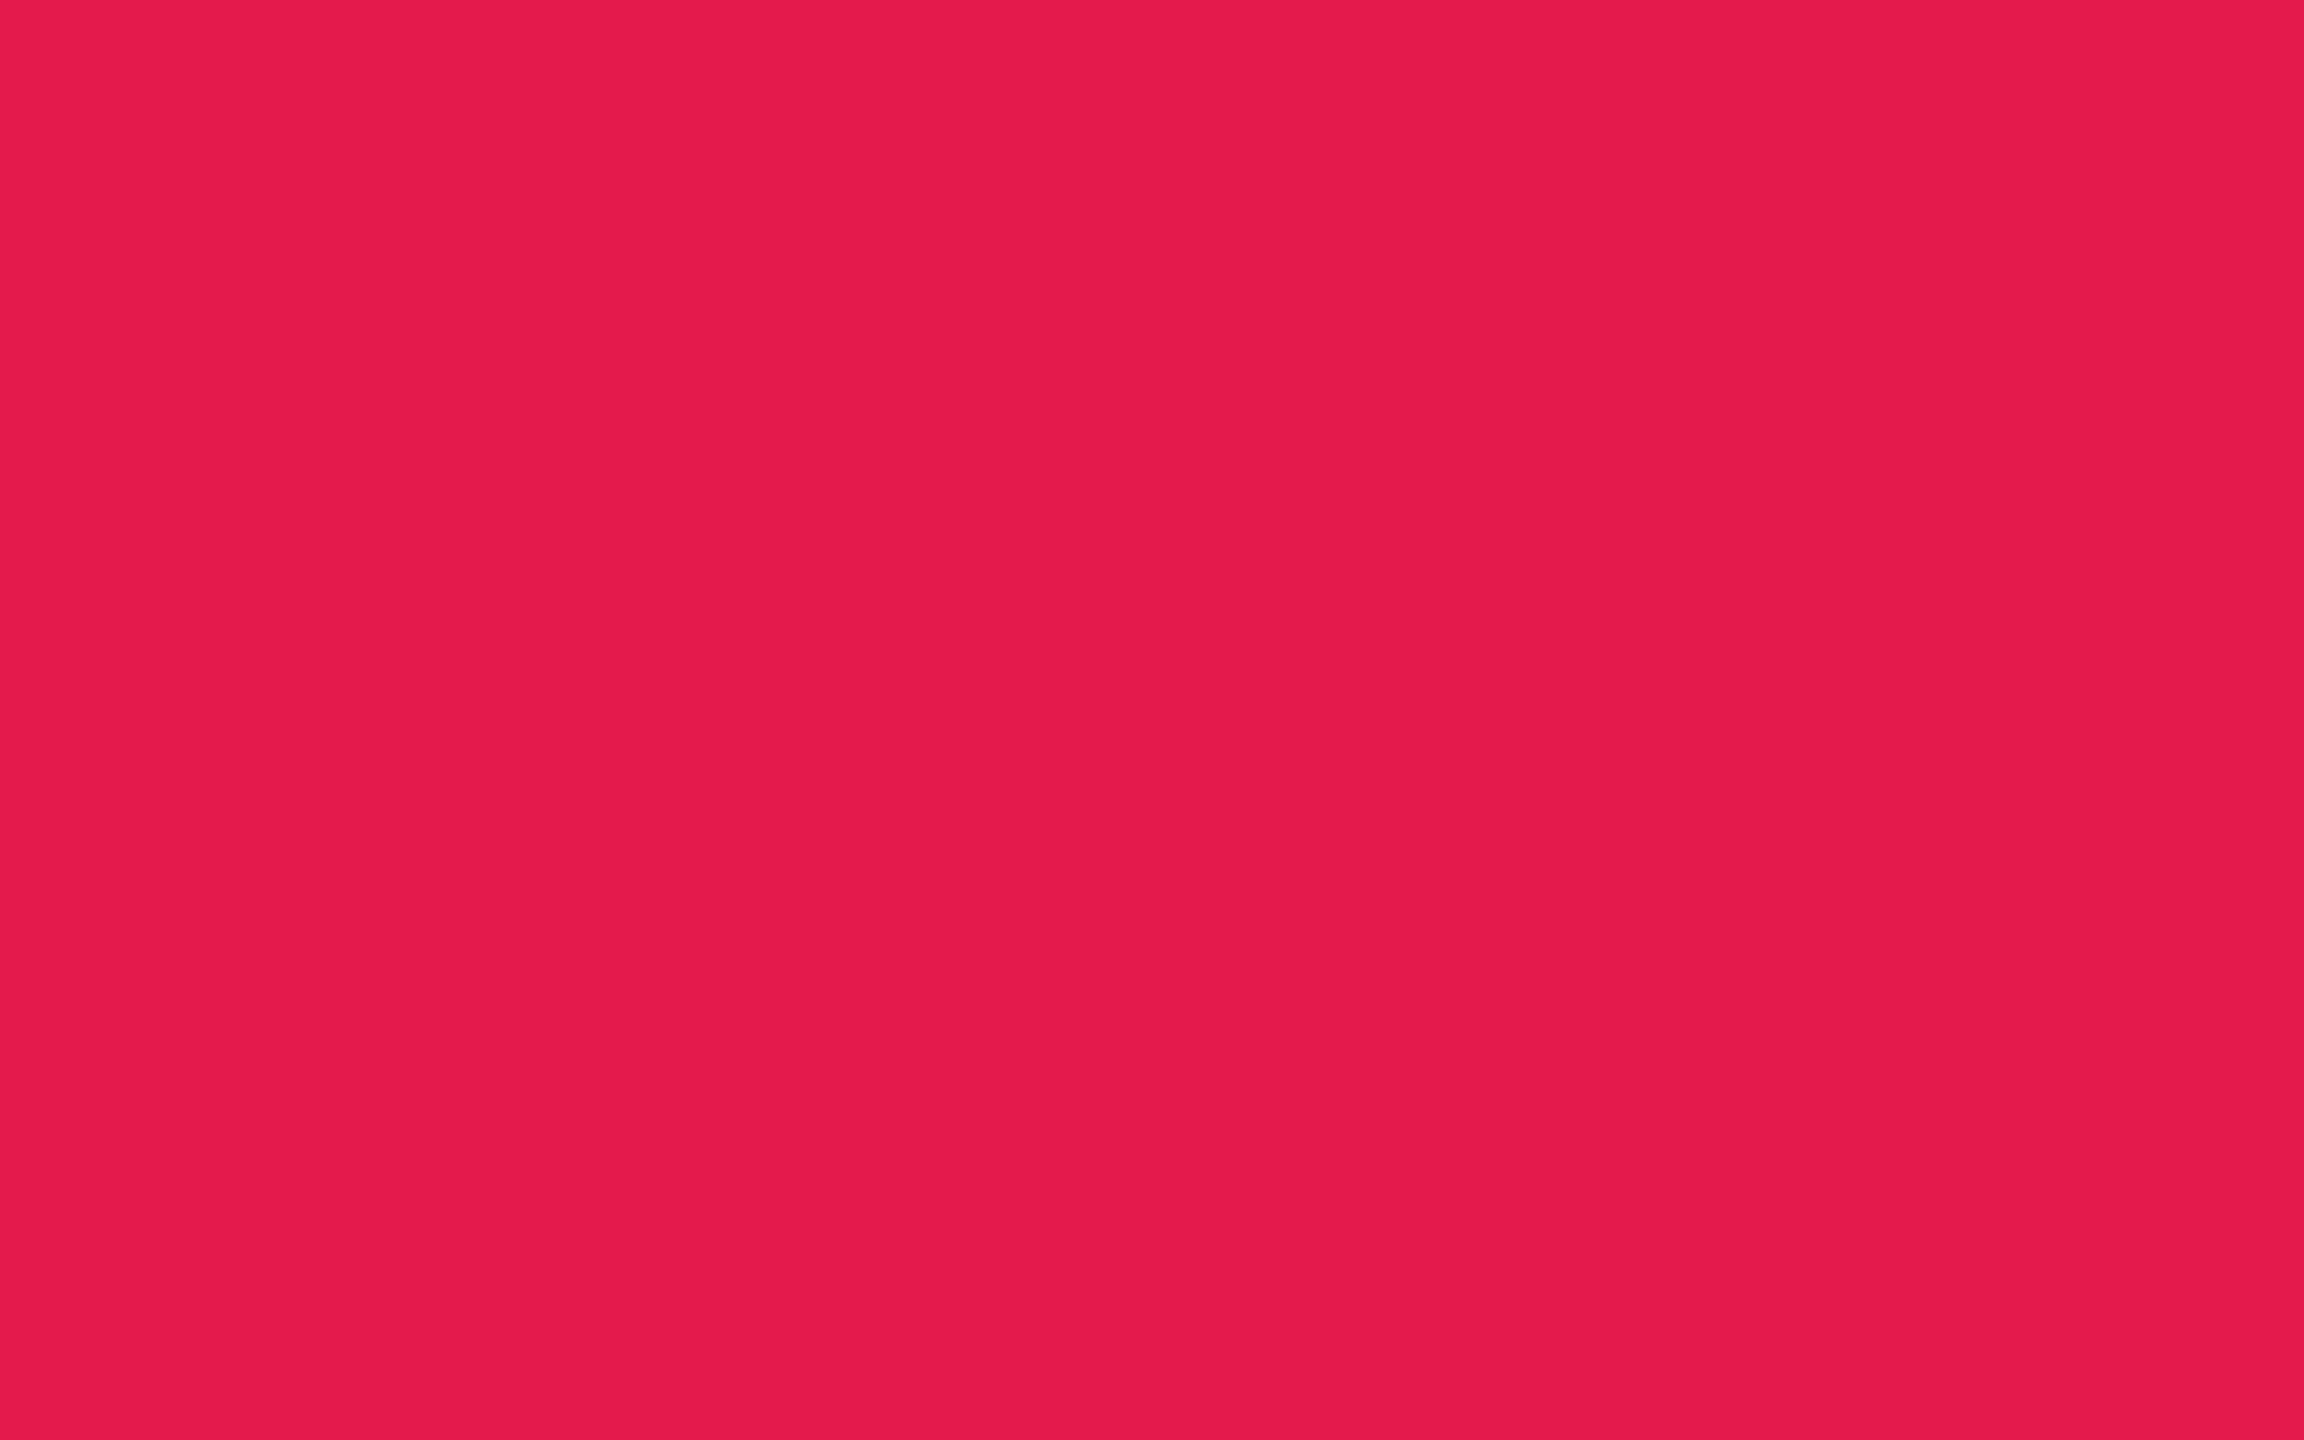 2304x1440 Spanish Crimson Solid Color Background